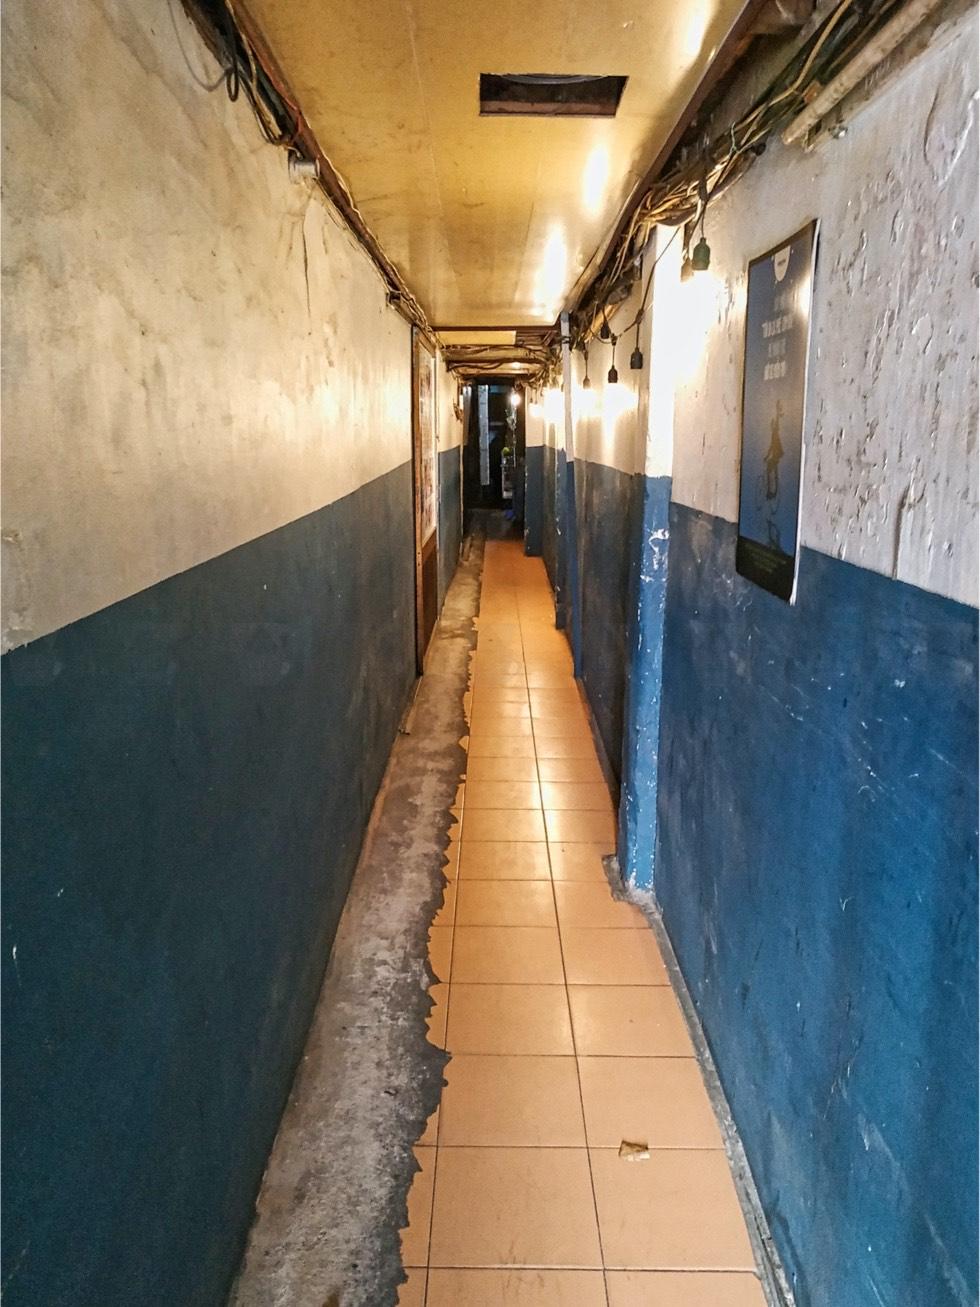 The Hidden Elephant Hallway